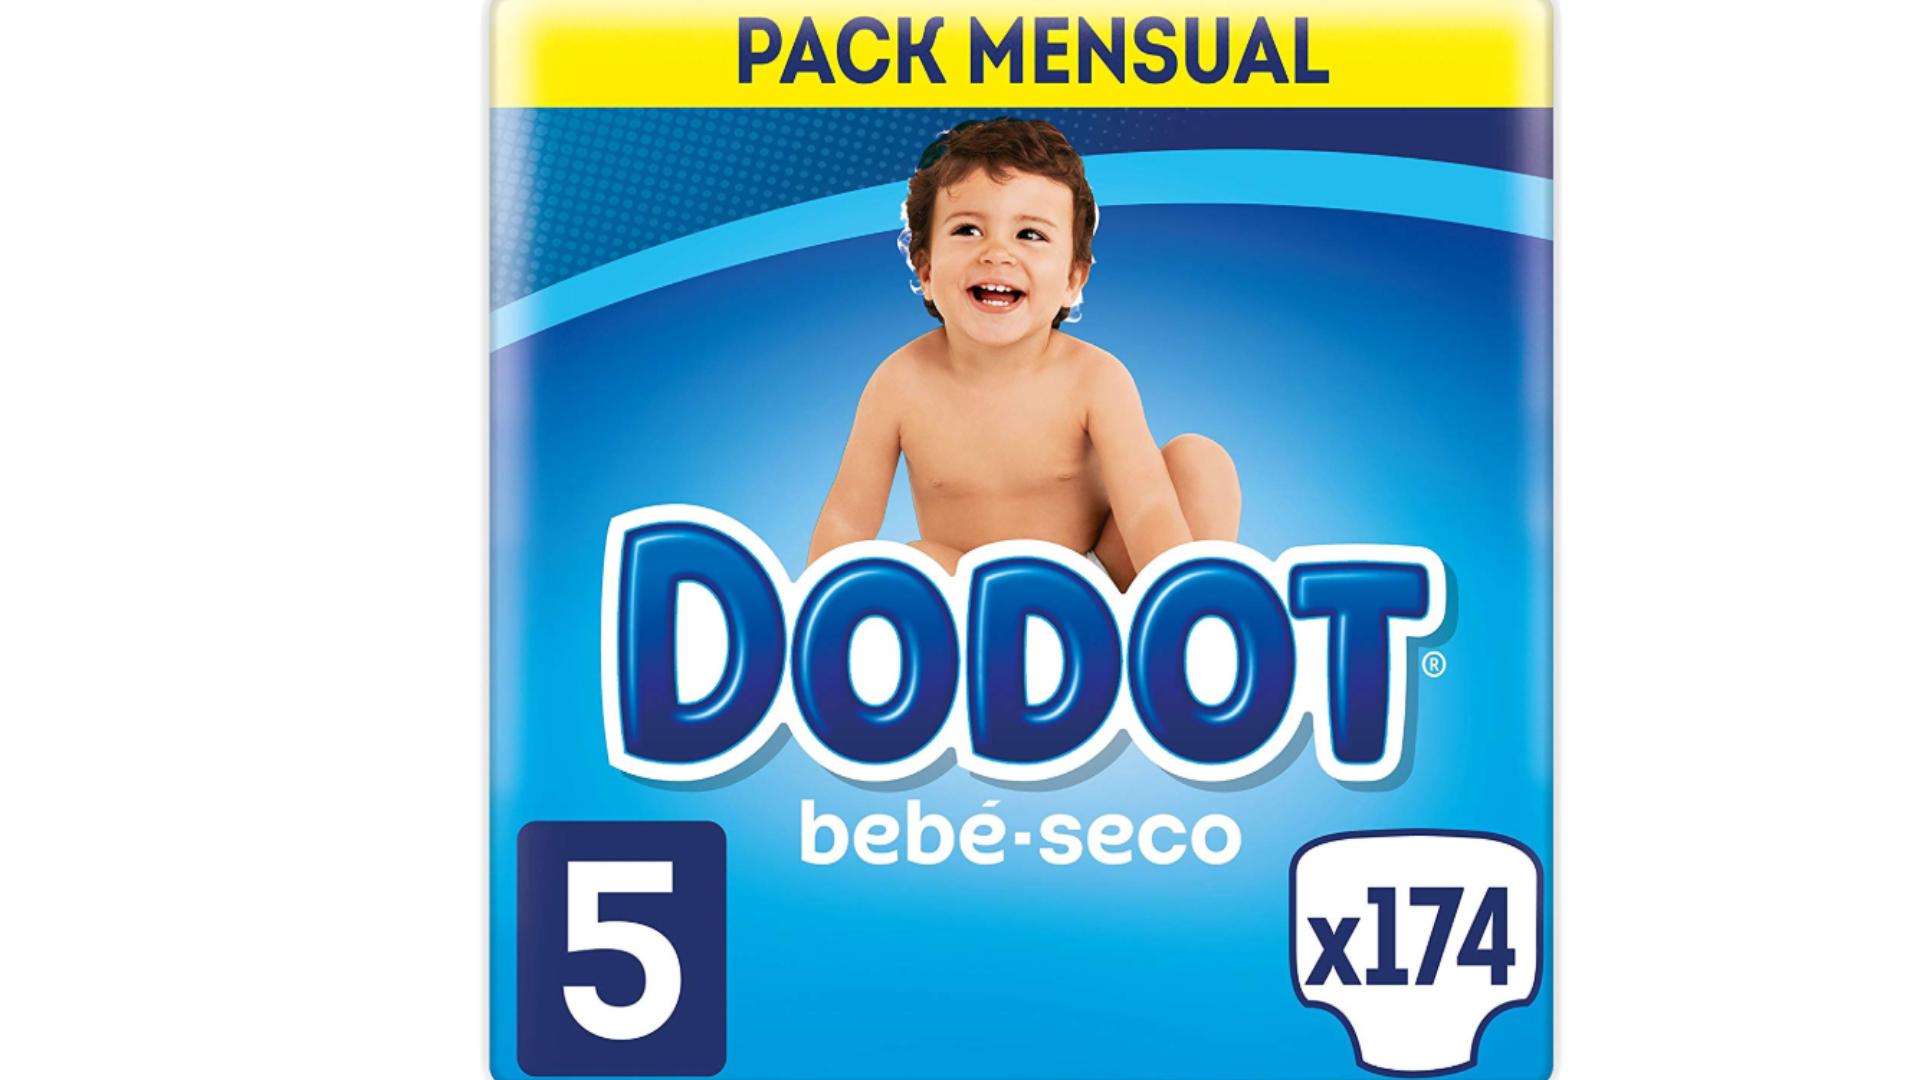 Dodot Bebé-Seco Pañales Talla 5, 174 Pañales